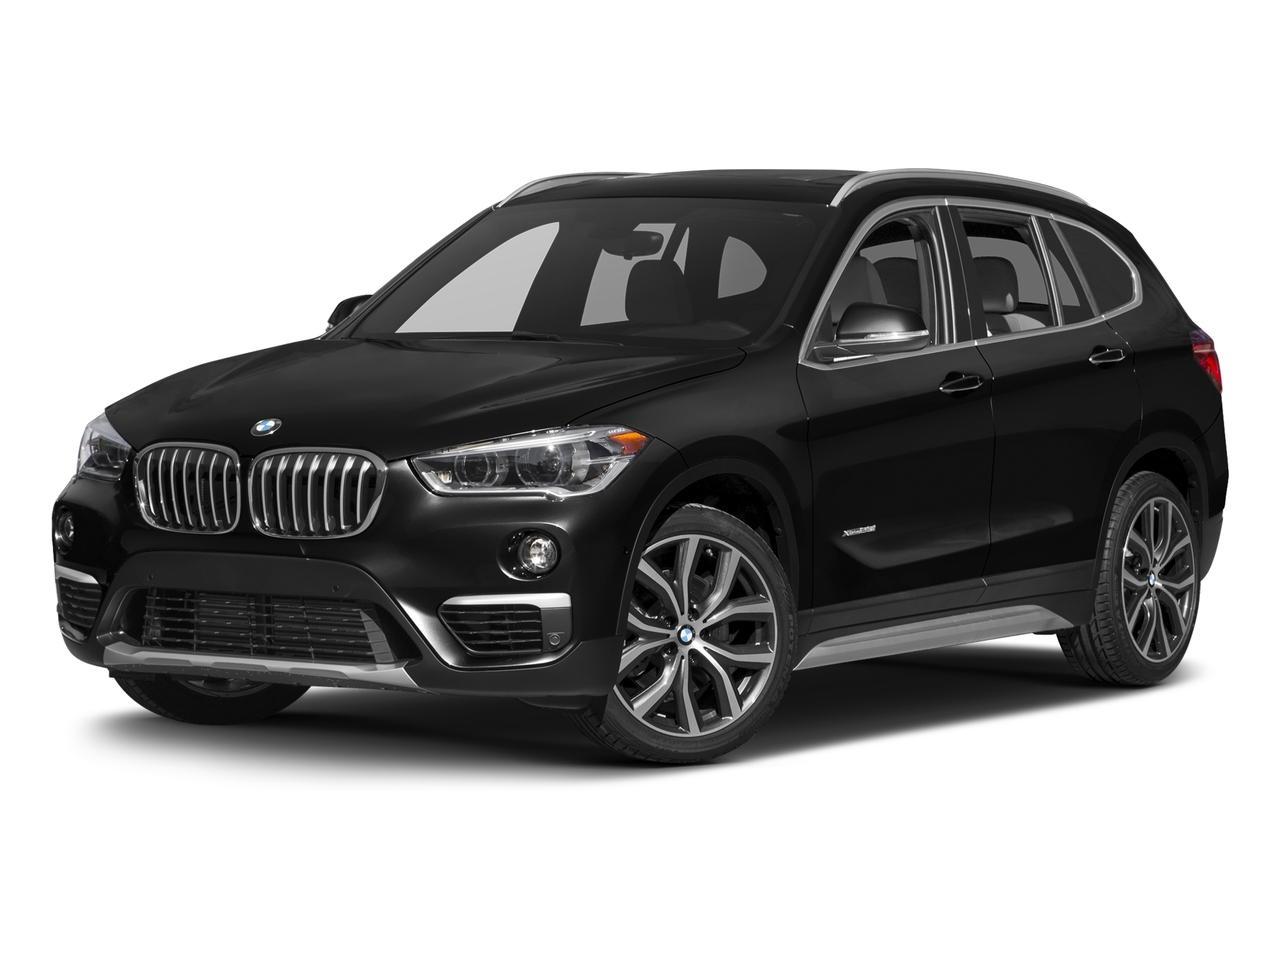 2017 BMW X1 xDrive28i Vehicle Photo in TEMPLE, TX 76504-3447